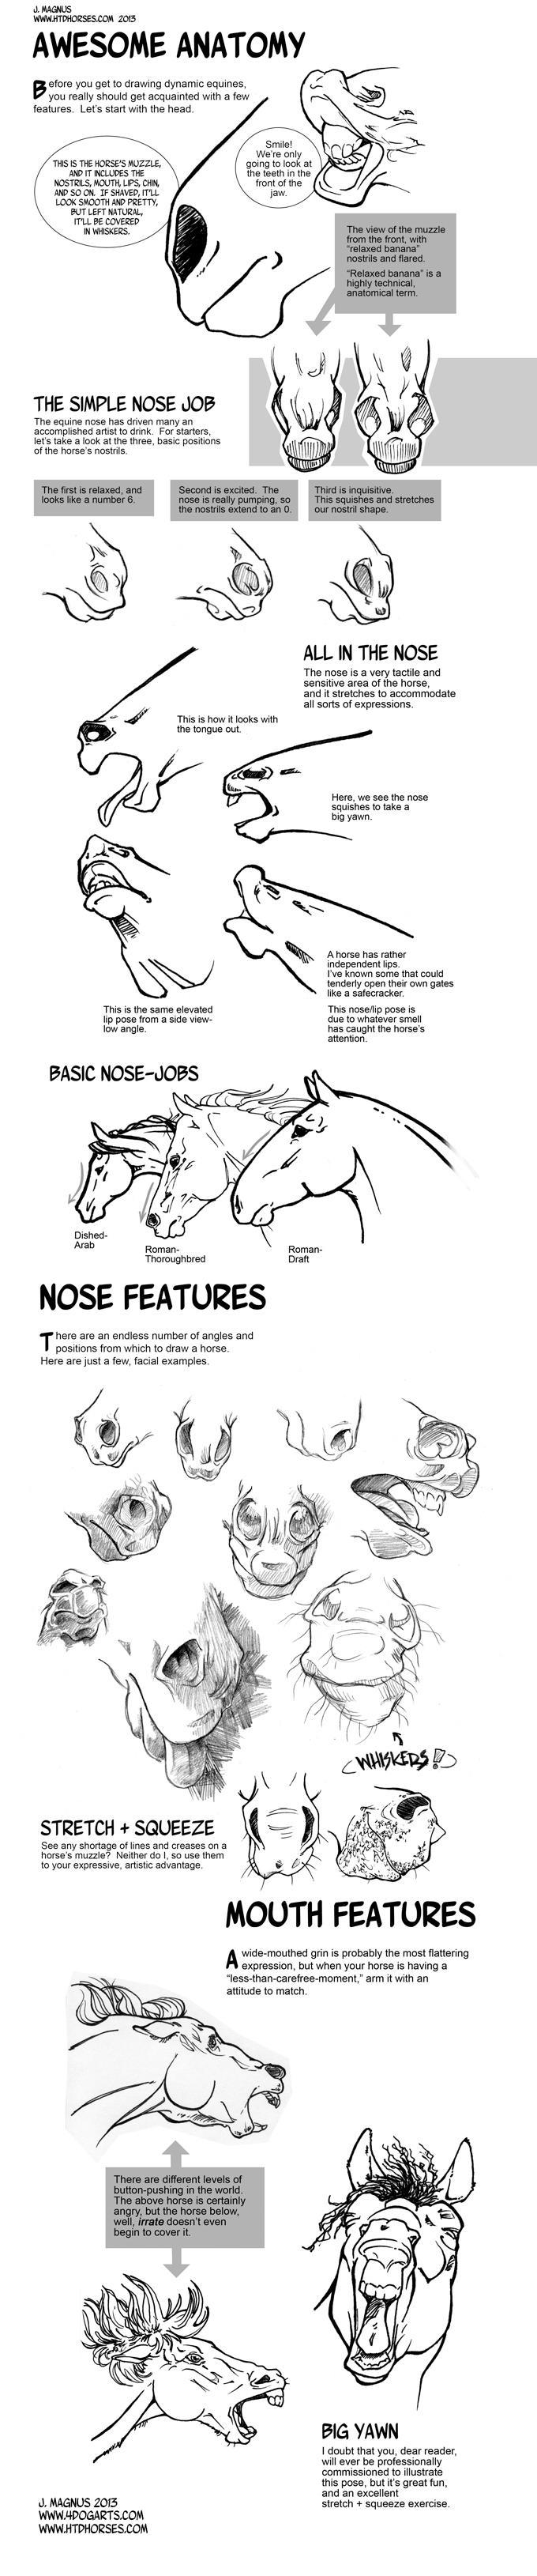 Horse Anatomy Part I By Sketcherjak On Deviantart